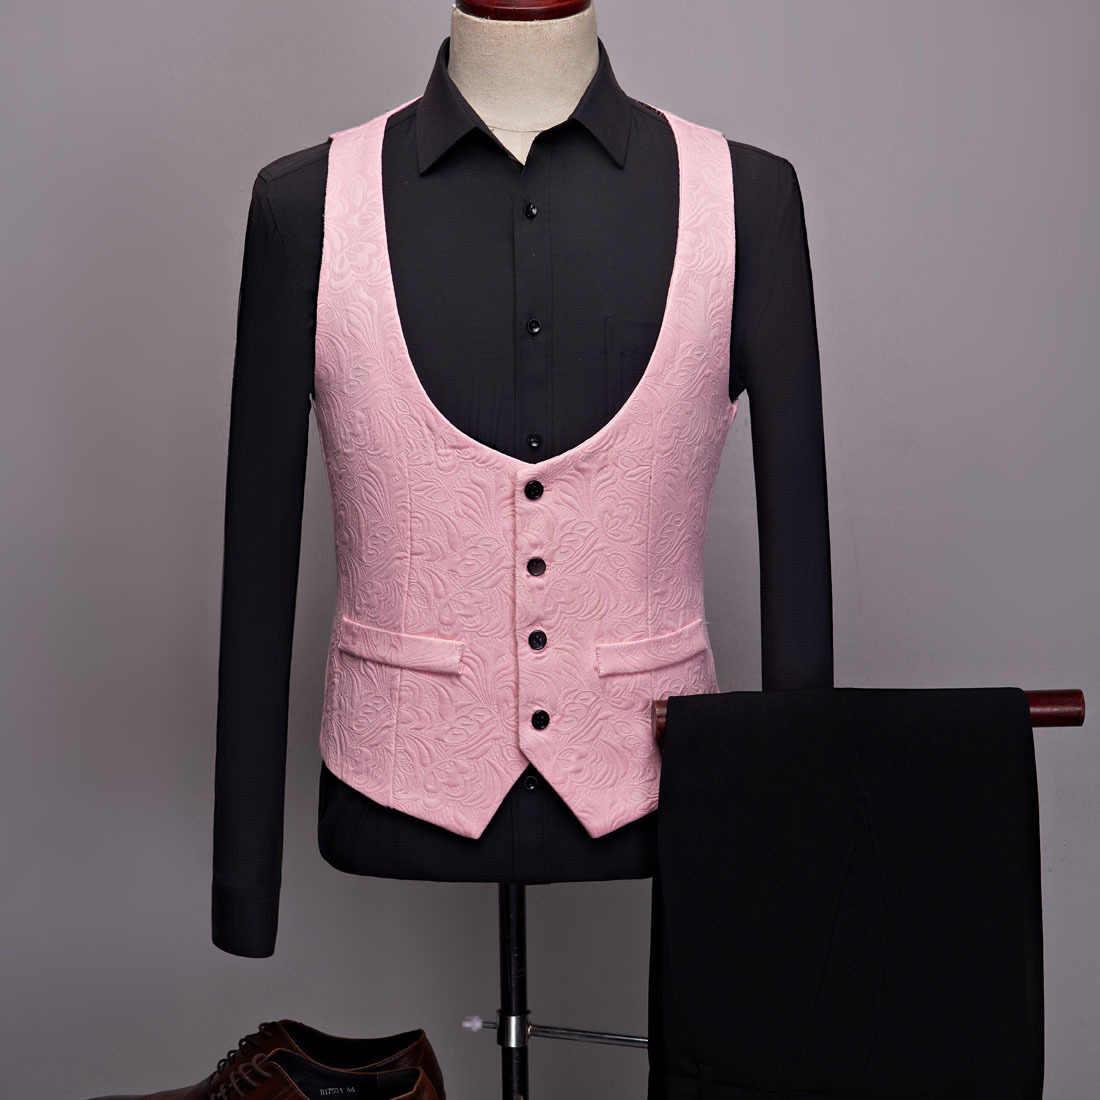 PYJTRL メンズファッションビッグショールラペル 3 枚セットピンク赤青白黒結婚式新郎スーツ品質ジャカード宴会タキシード